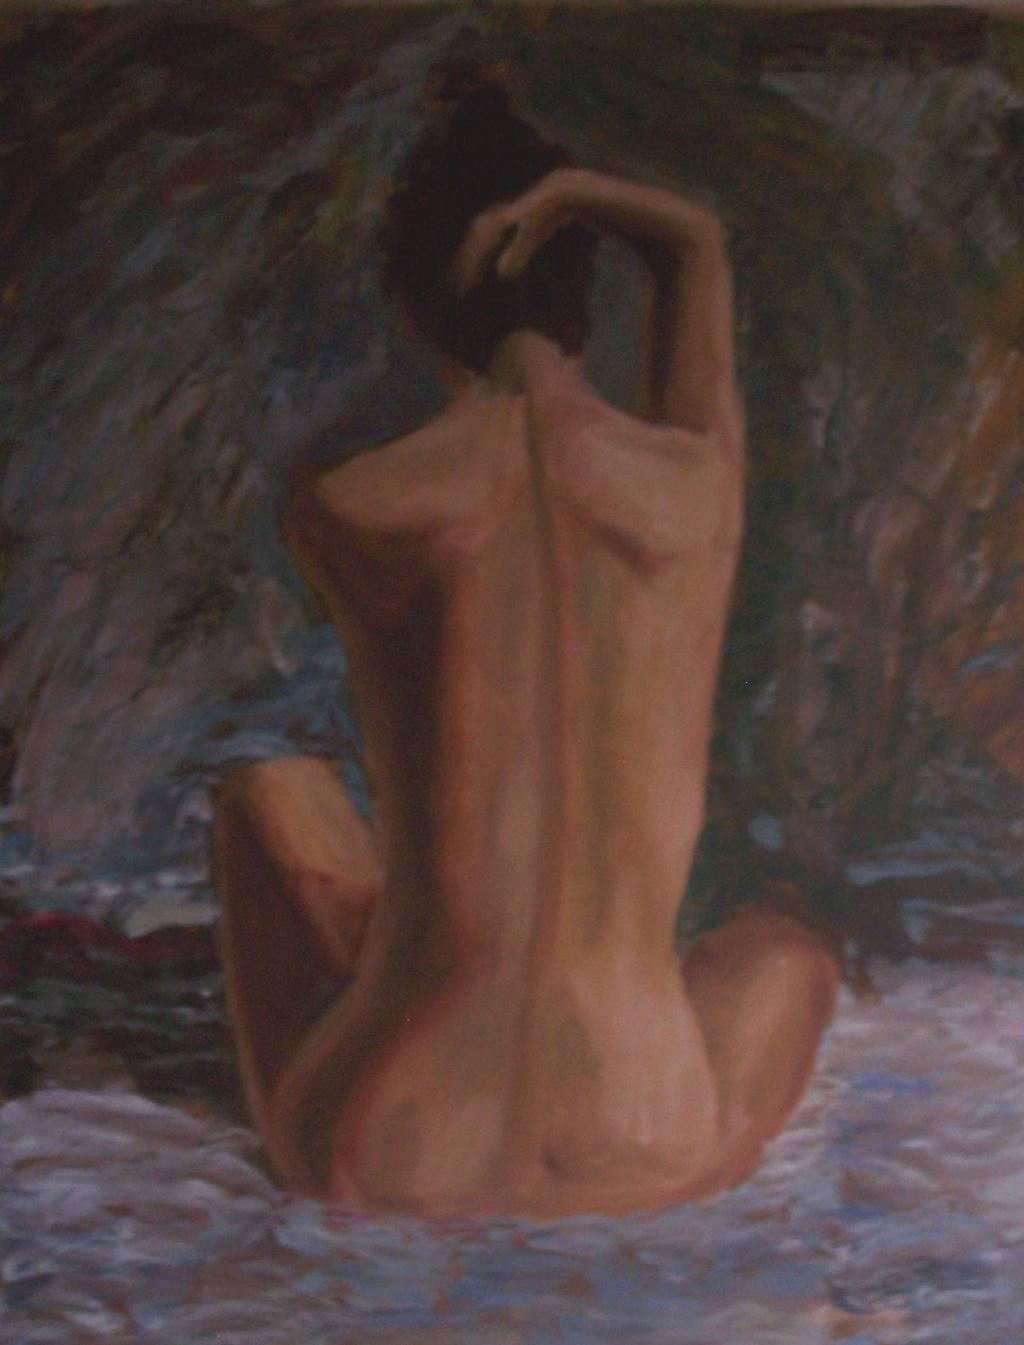 Abuela desnuda Search - XVIDEOSCOM